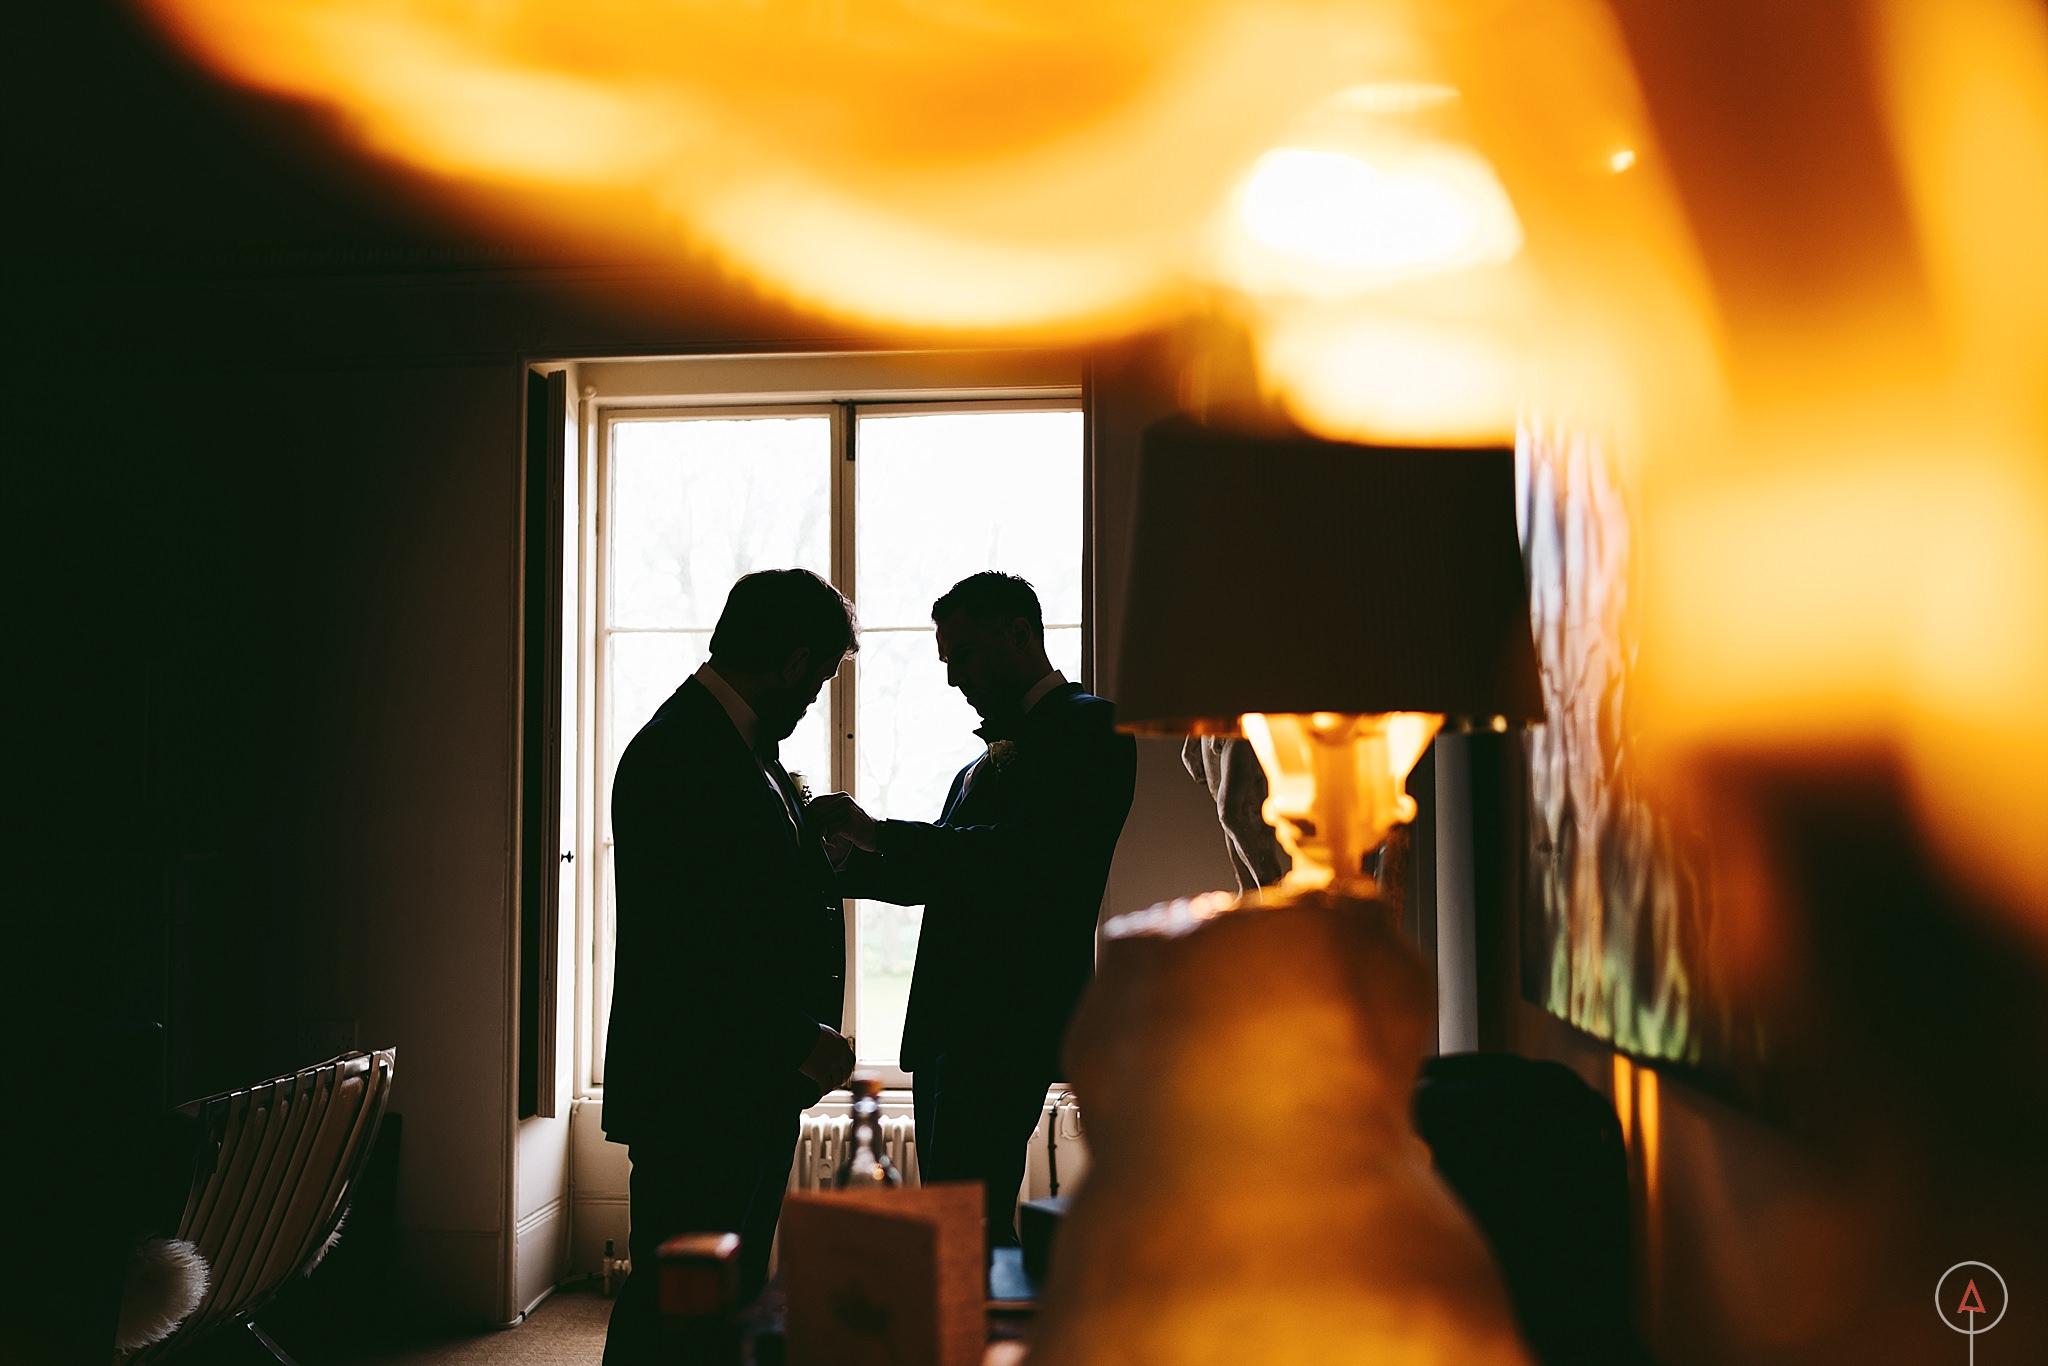 cardiff-wedding-photographer-aga-tomaszek_0234